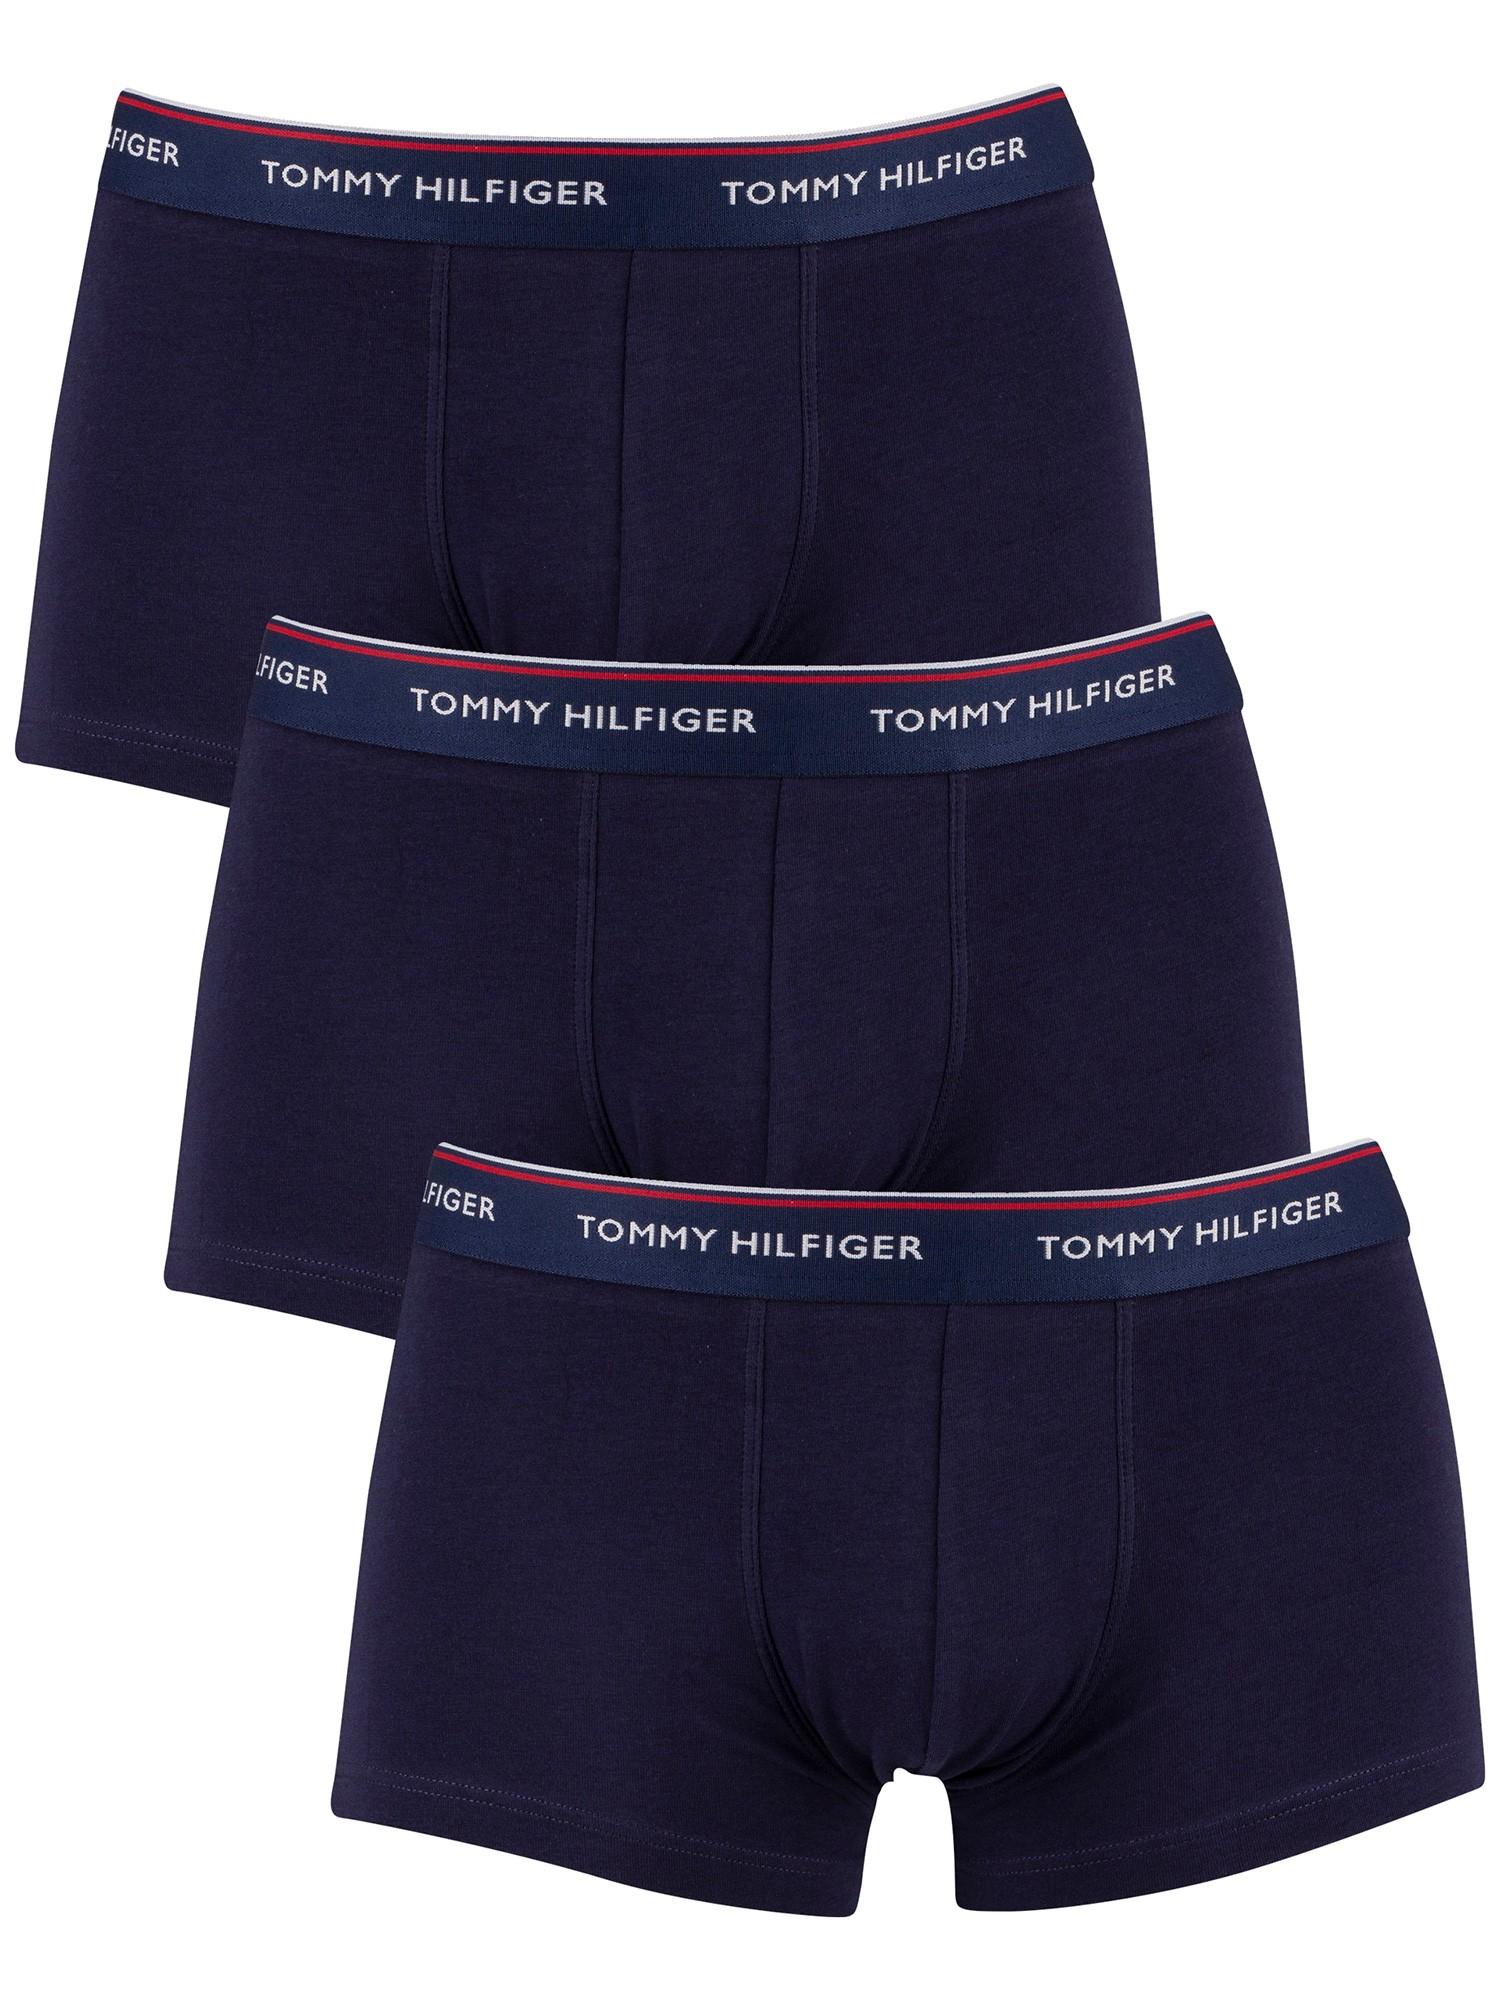 Tommy Hilfiger Men/'s 3 Pack Premium Essentials Trunks Blue